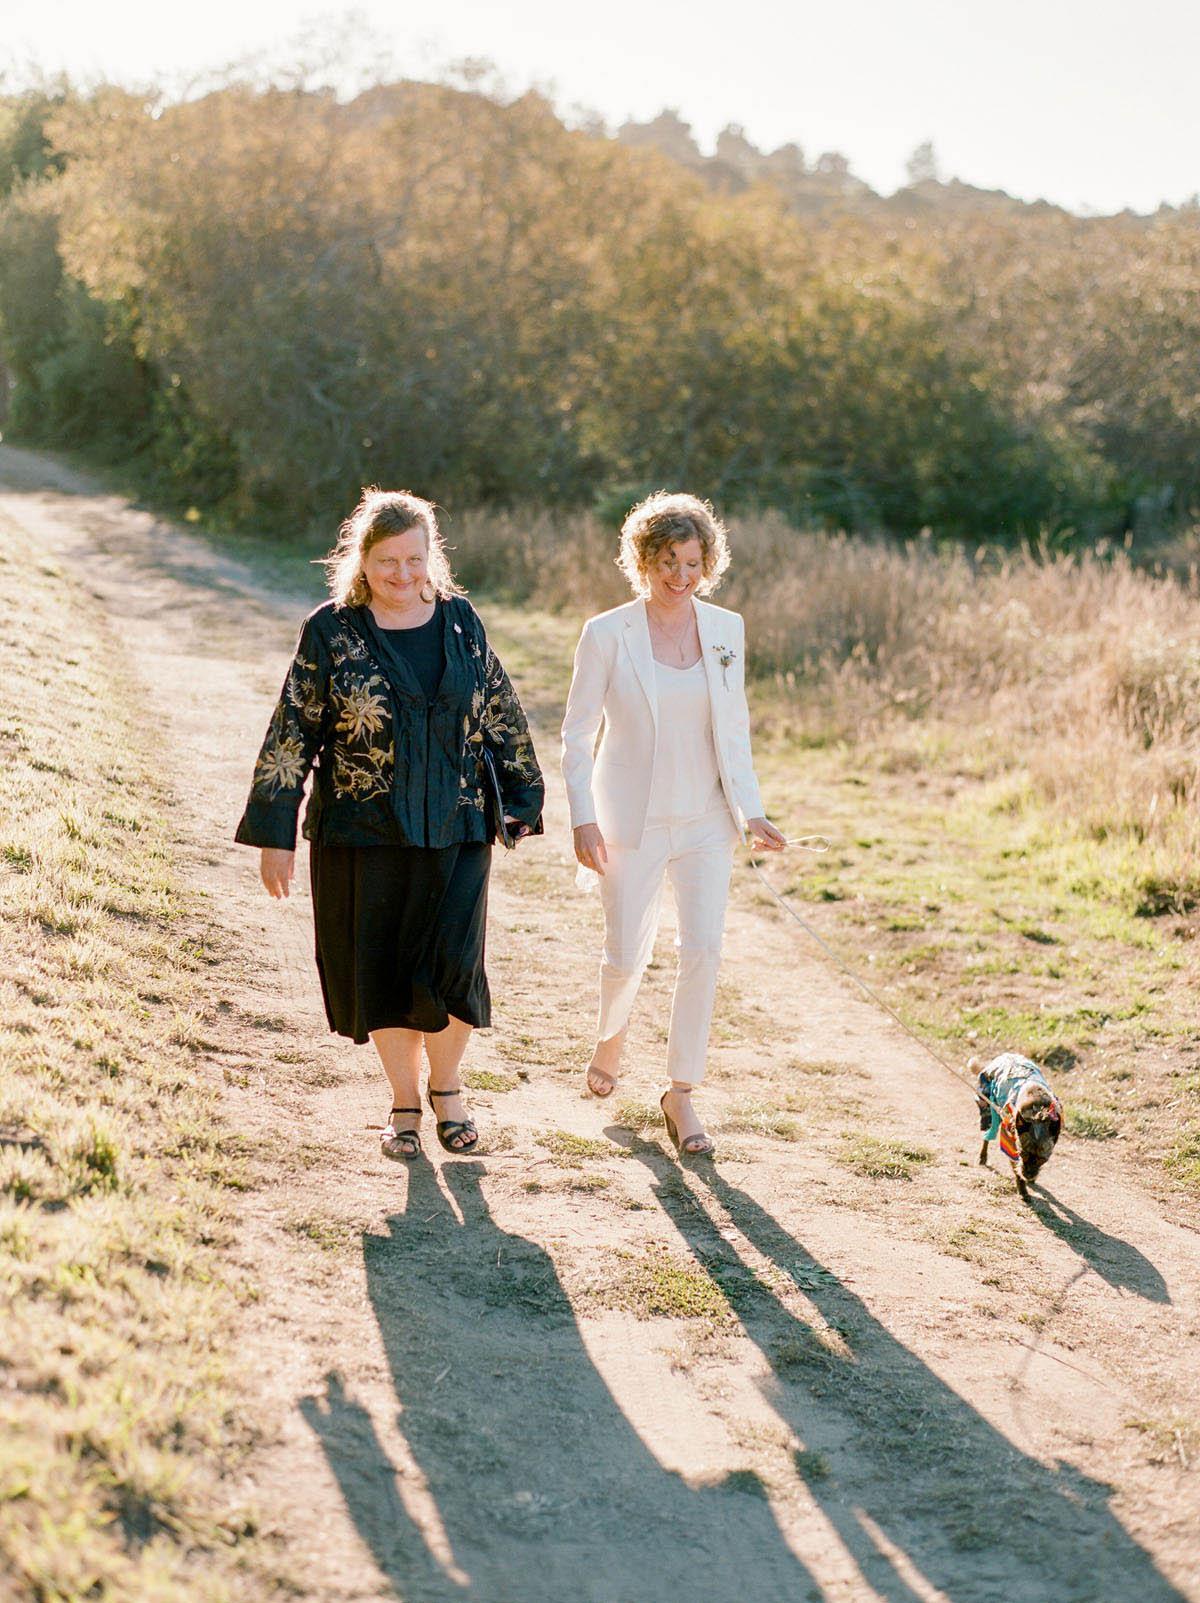 7-bride-dog-walking.jpg